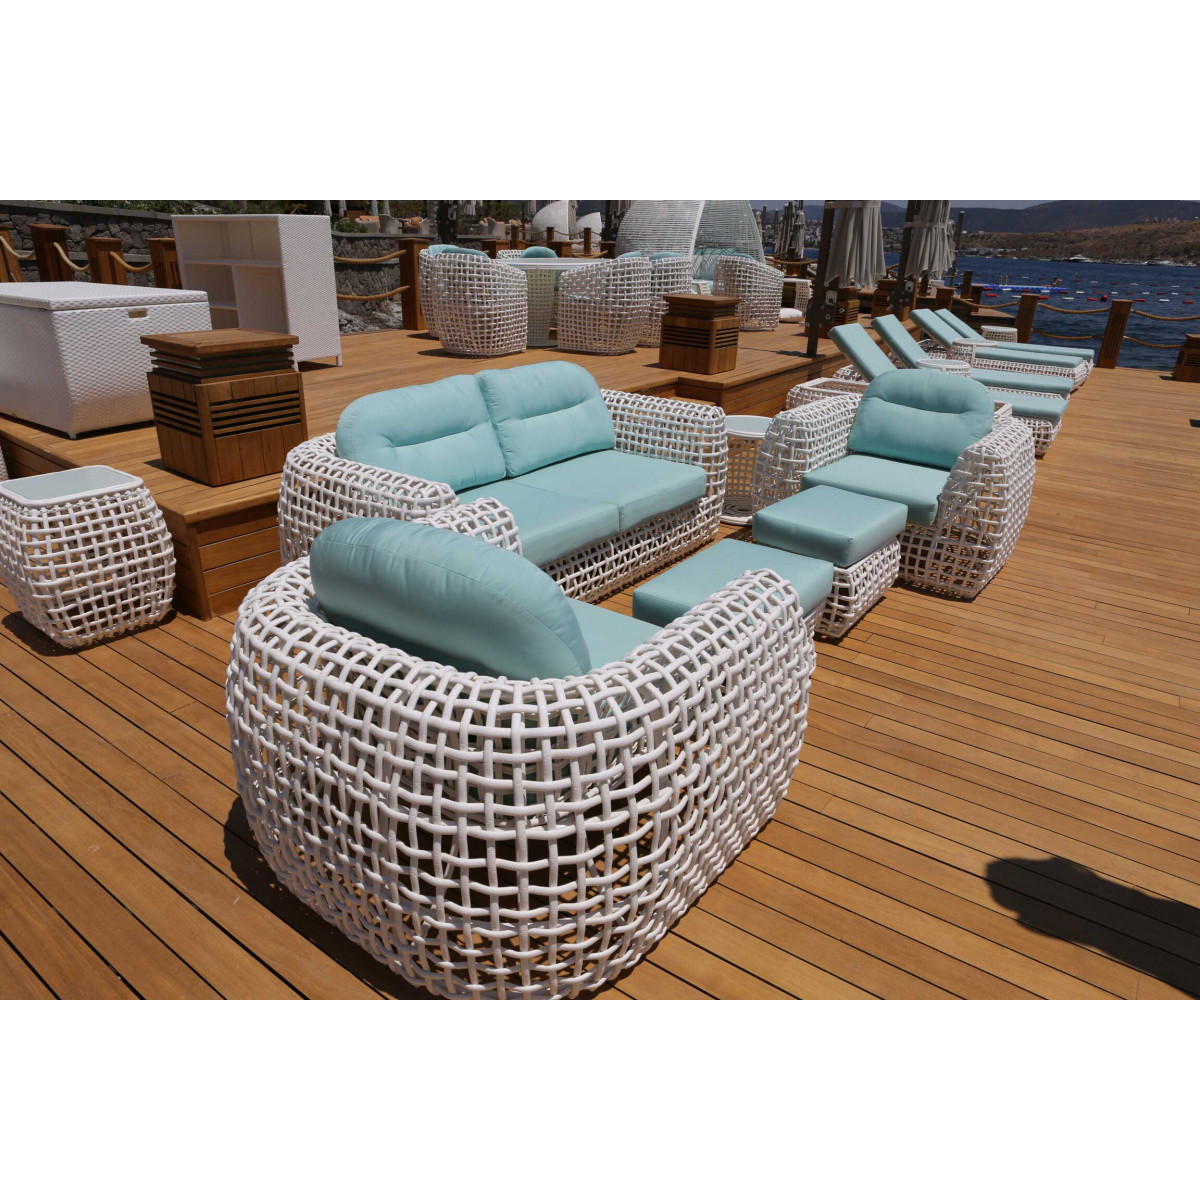 fauteuil liane de resine tressee blanche royo de lusso matters blanc 02 310